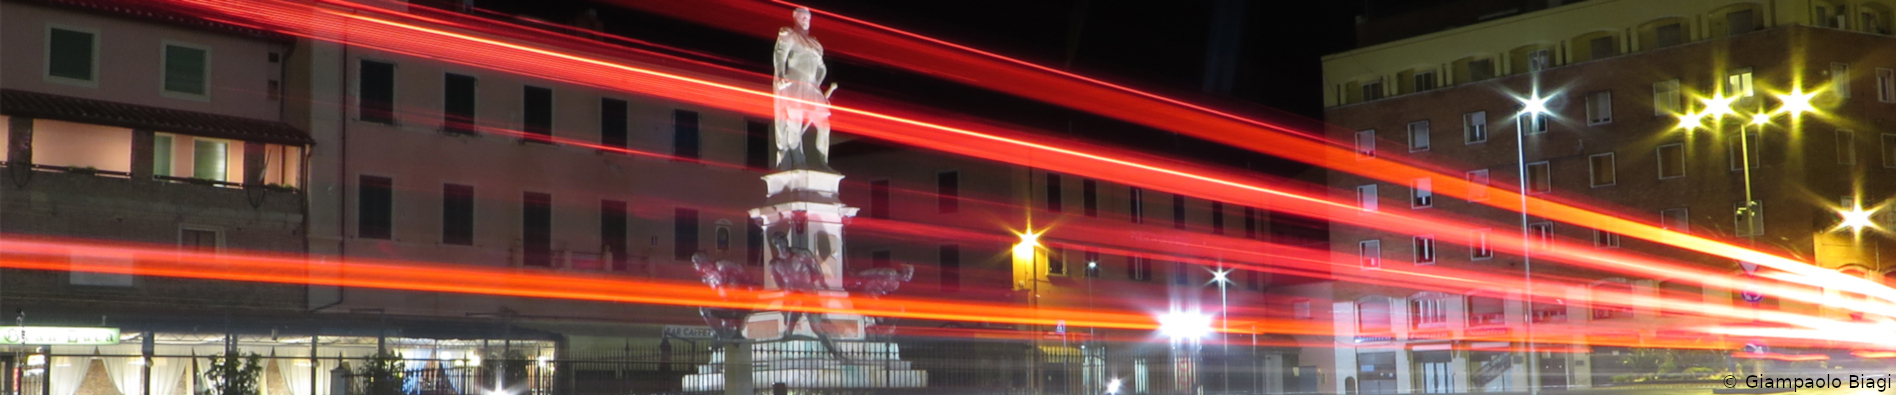 monumento quattro mori in notturna